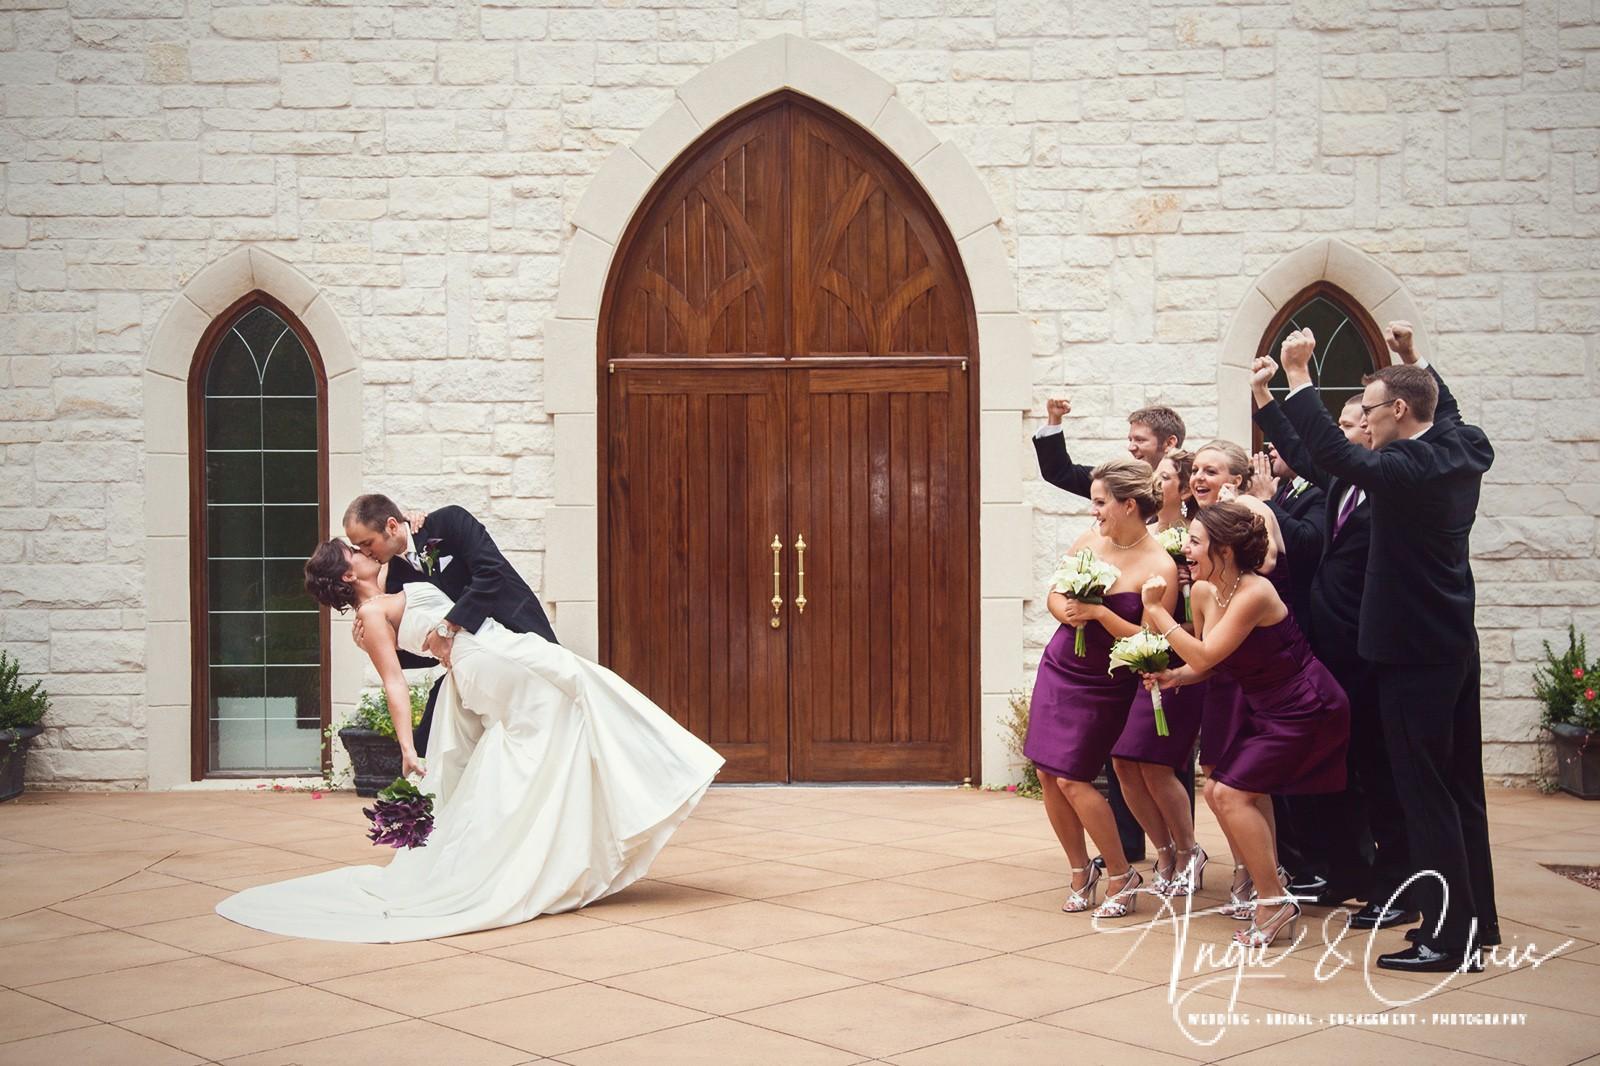 Lauren & Ryan Jenkinson Wedding at Ashton Gardens